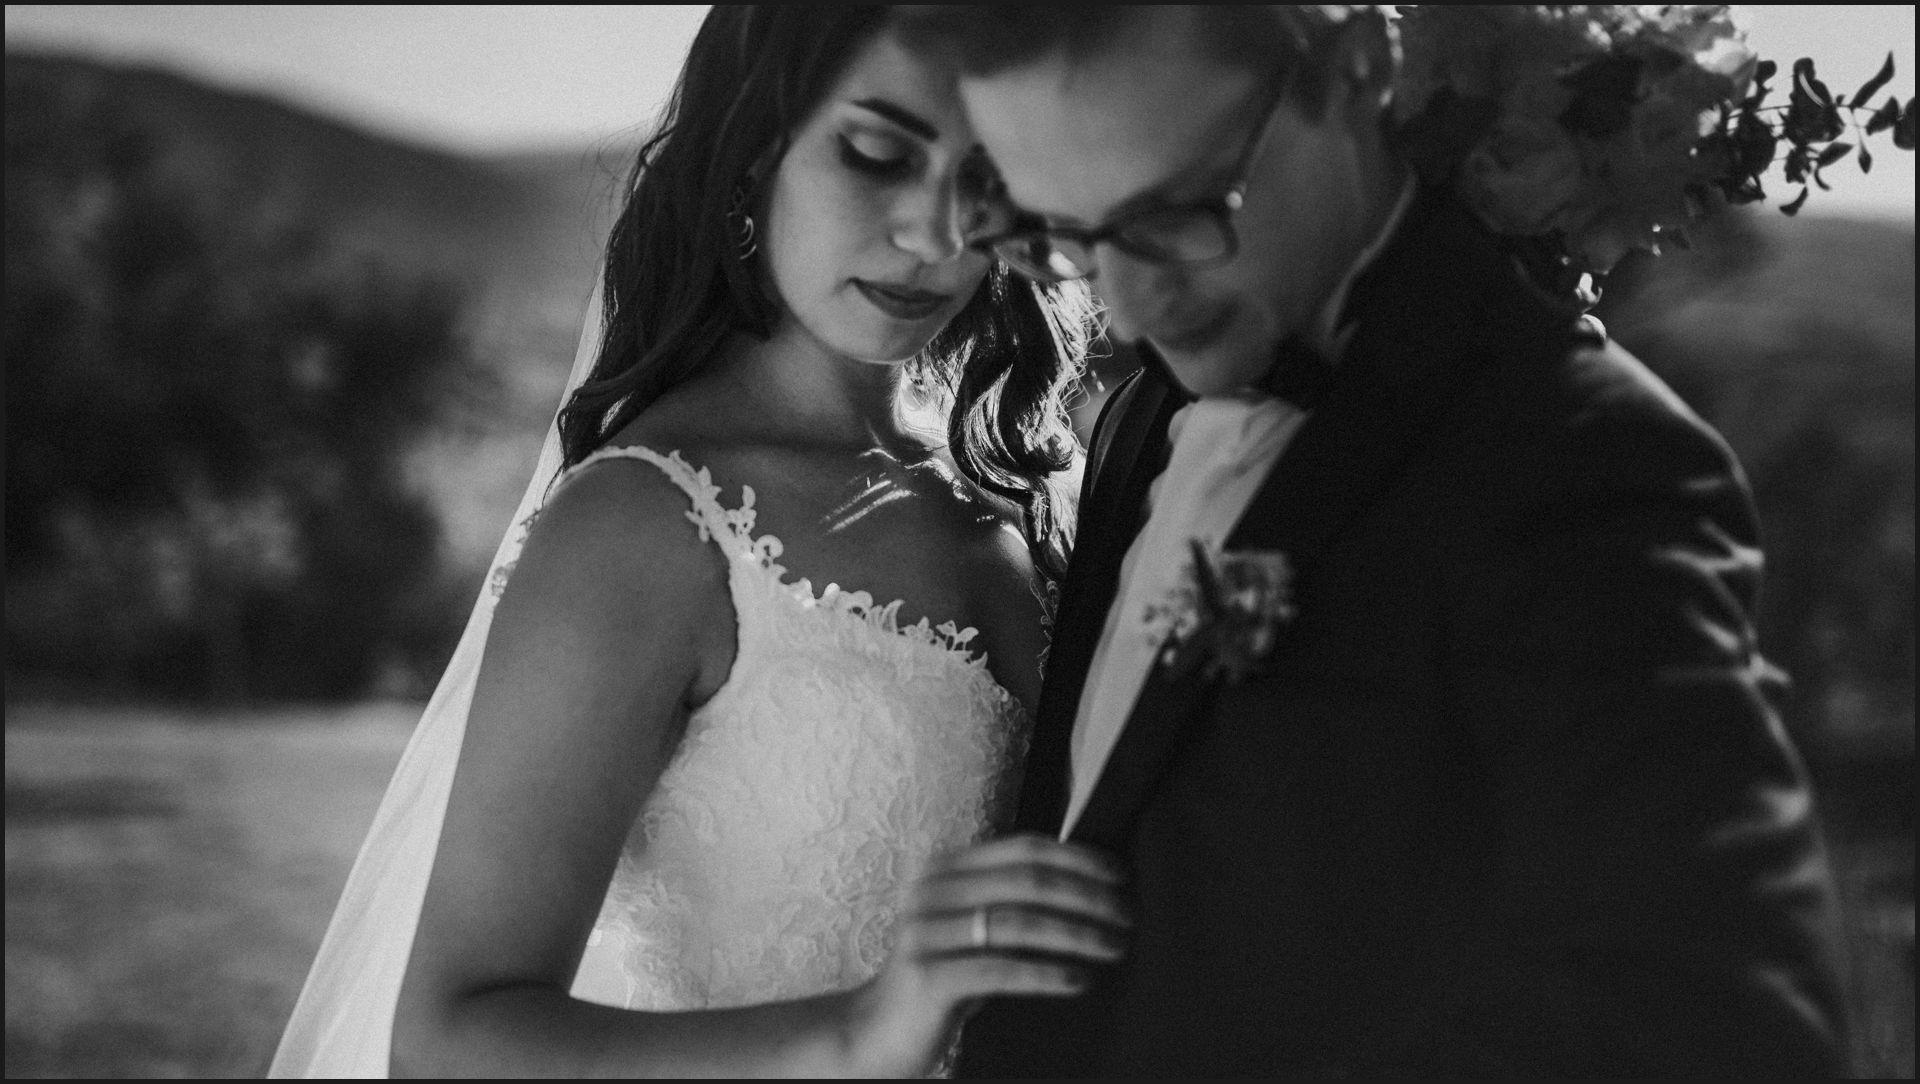 black and white, wedding, umbria, nikis resort, bride, groom